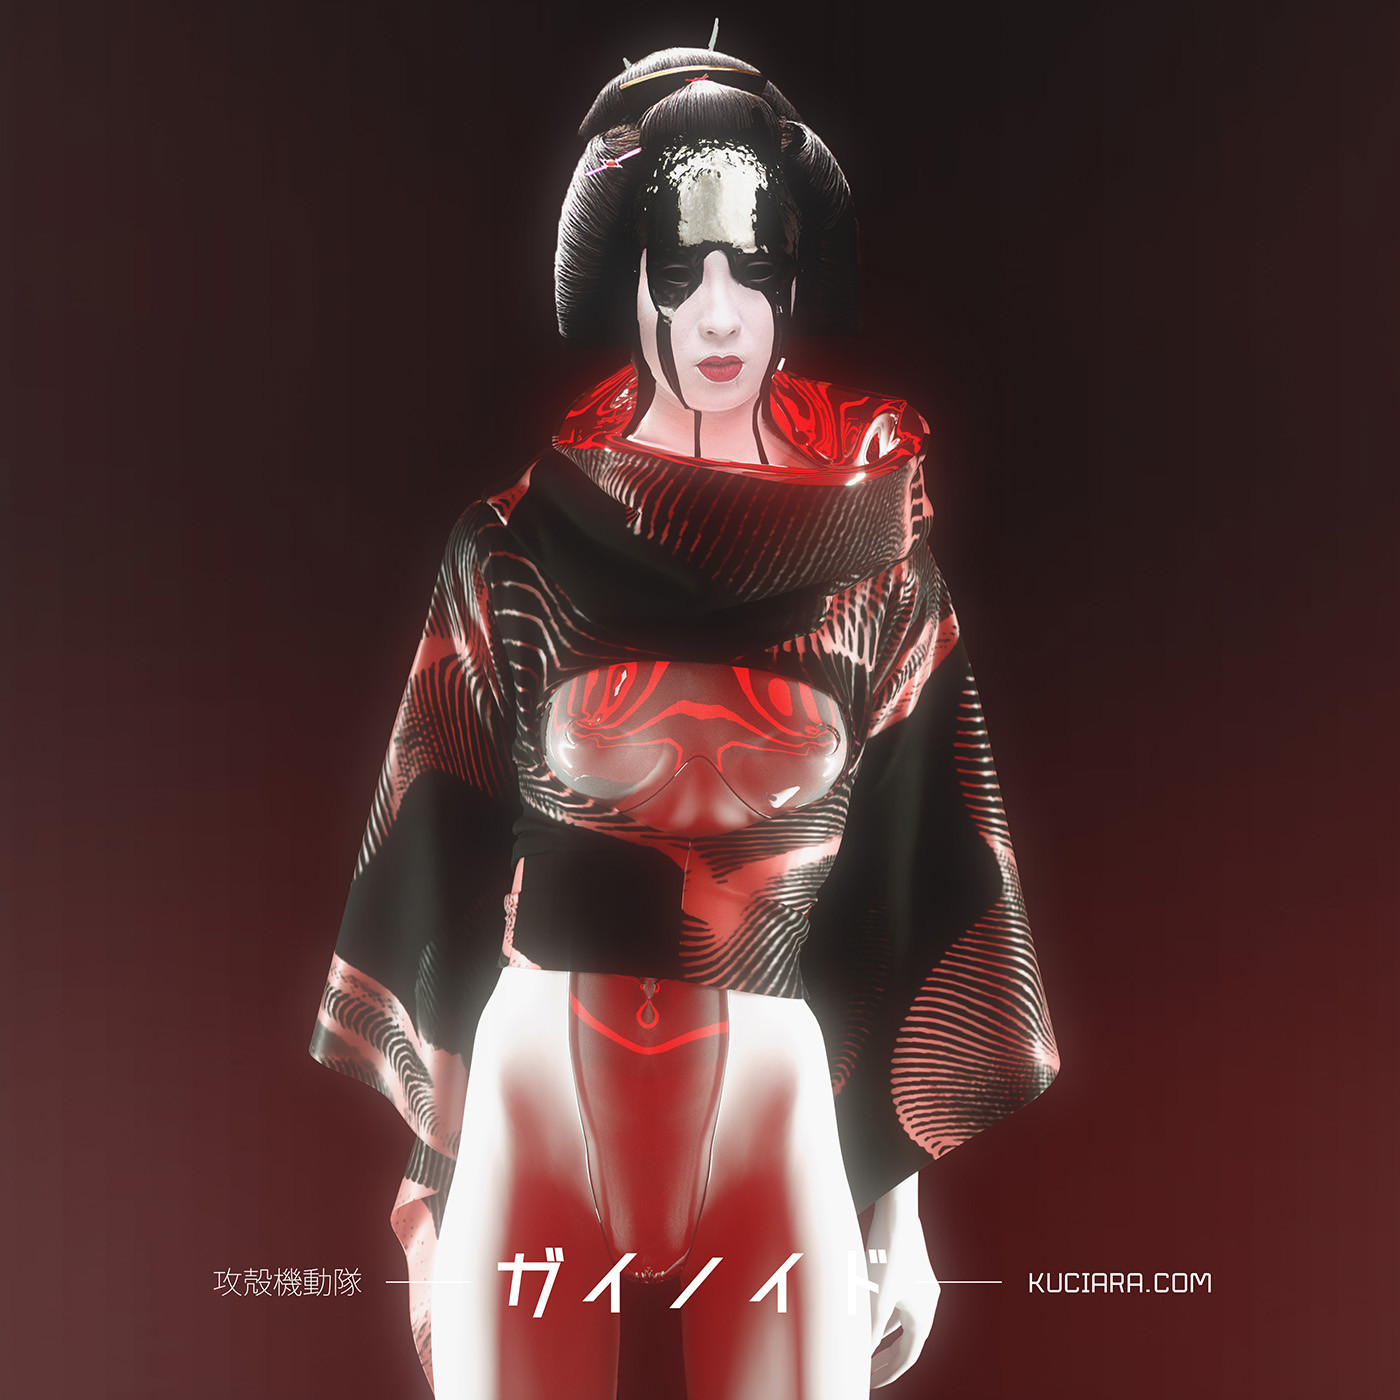 Maciej kuciara 150811 cha geisha kimono mk cam01 v007